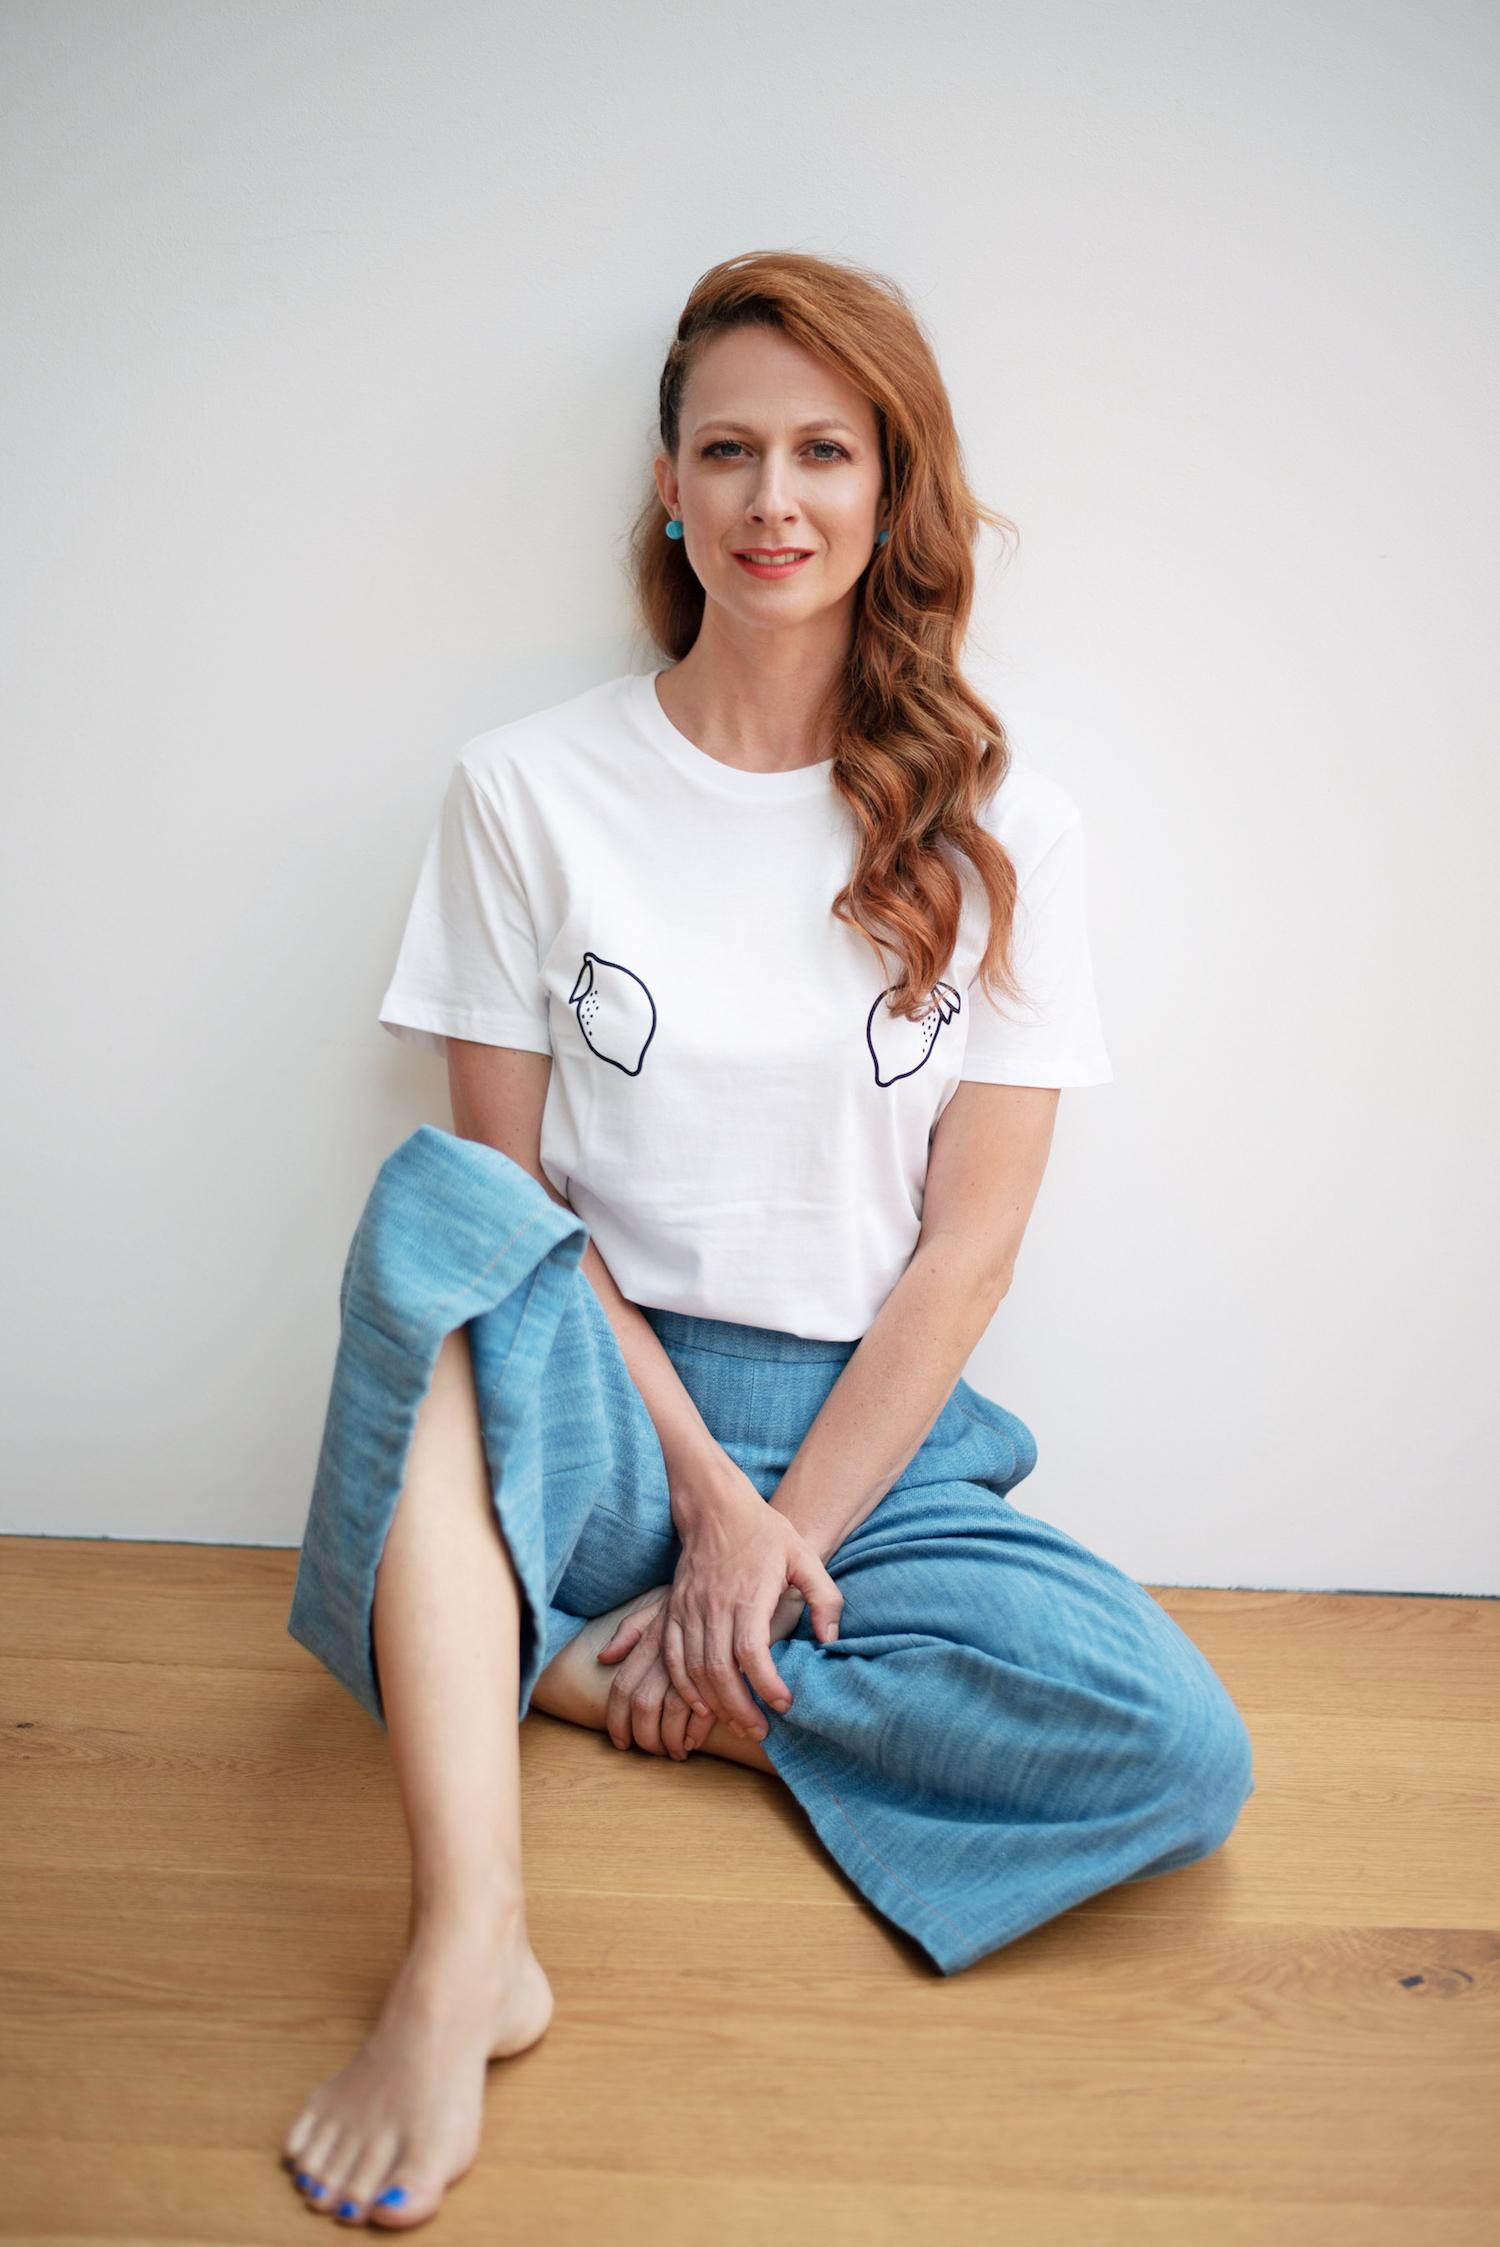 sustainable trajnostno majica eko bombaz nina stanic nika veger modni bloger beautyfullblog